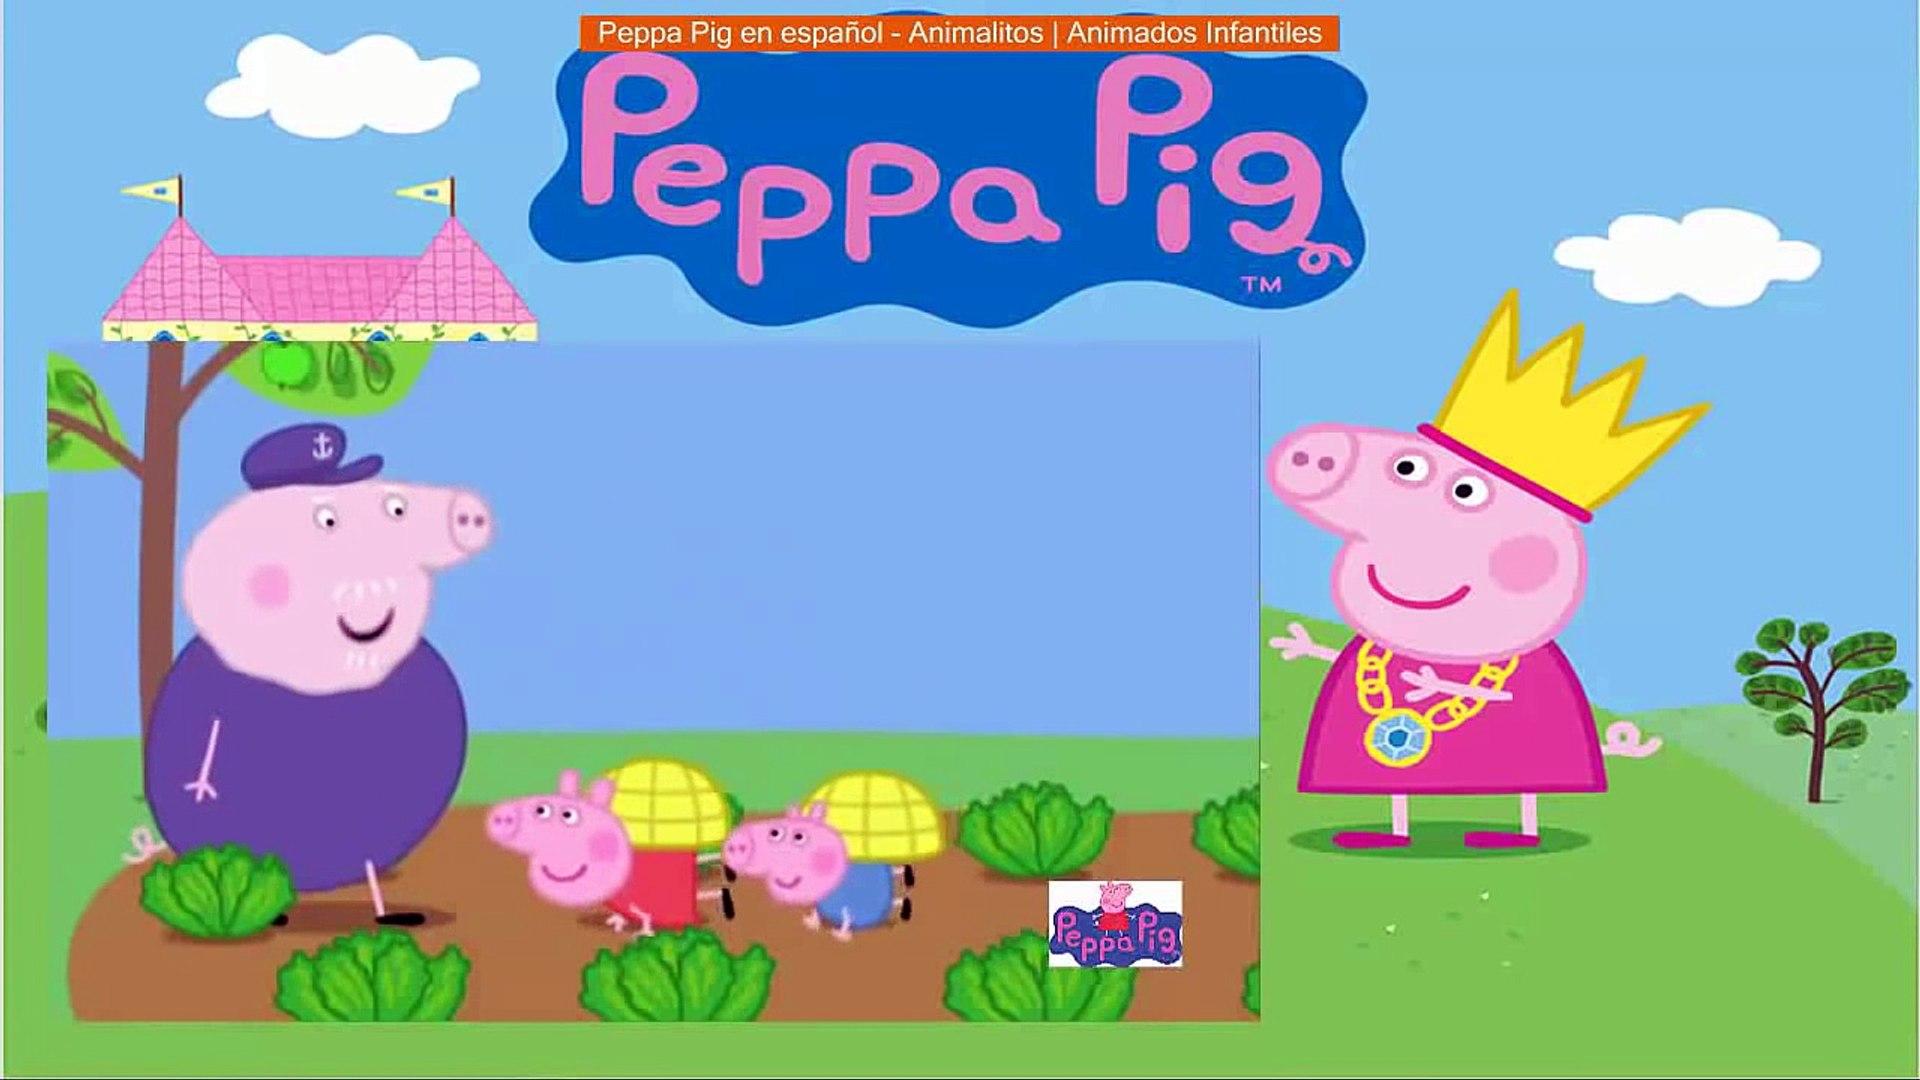 discovery kids Peppa Pig en español - Animalitos | Animados Infantiles discovery kids